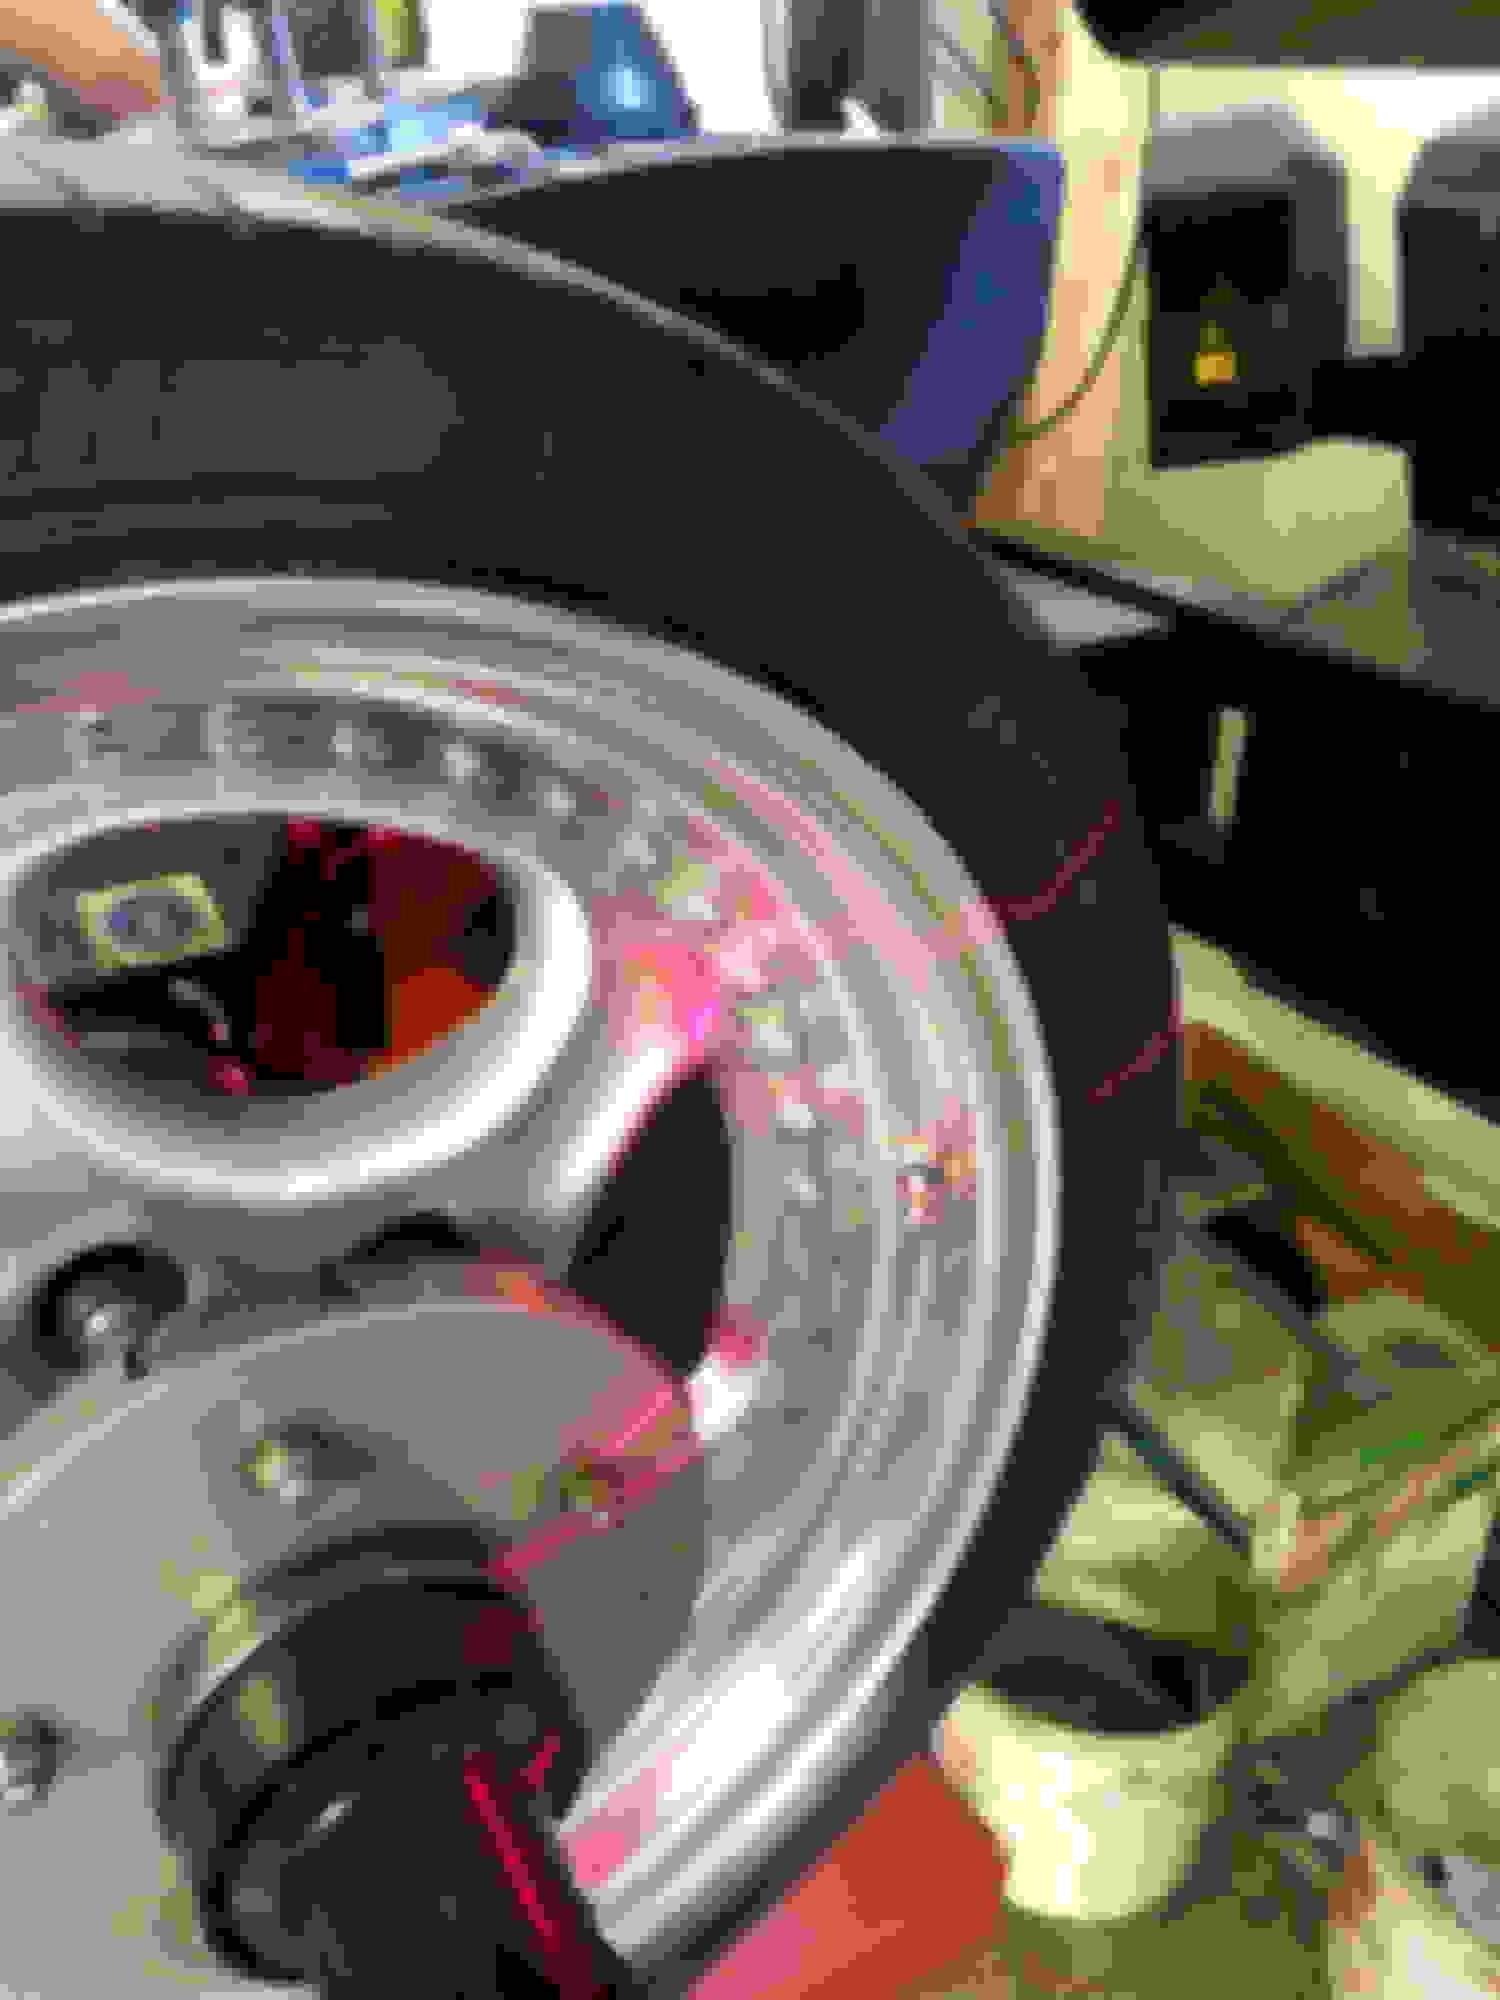 Tramont Cup 2 Group Buy - Page 16 - Rennlist - Porsche